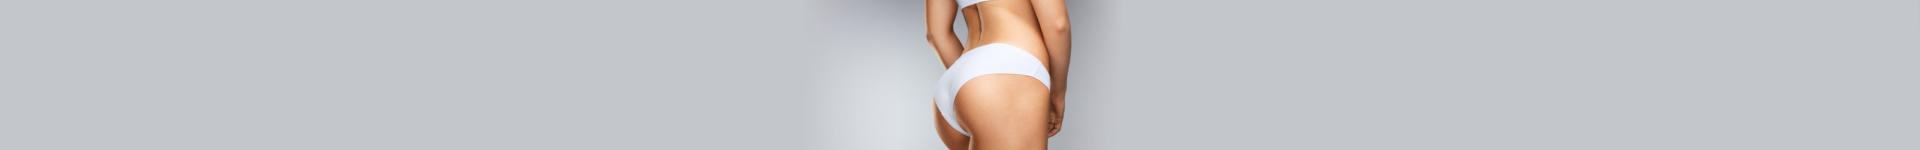 female showing undergarment